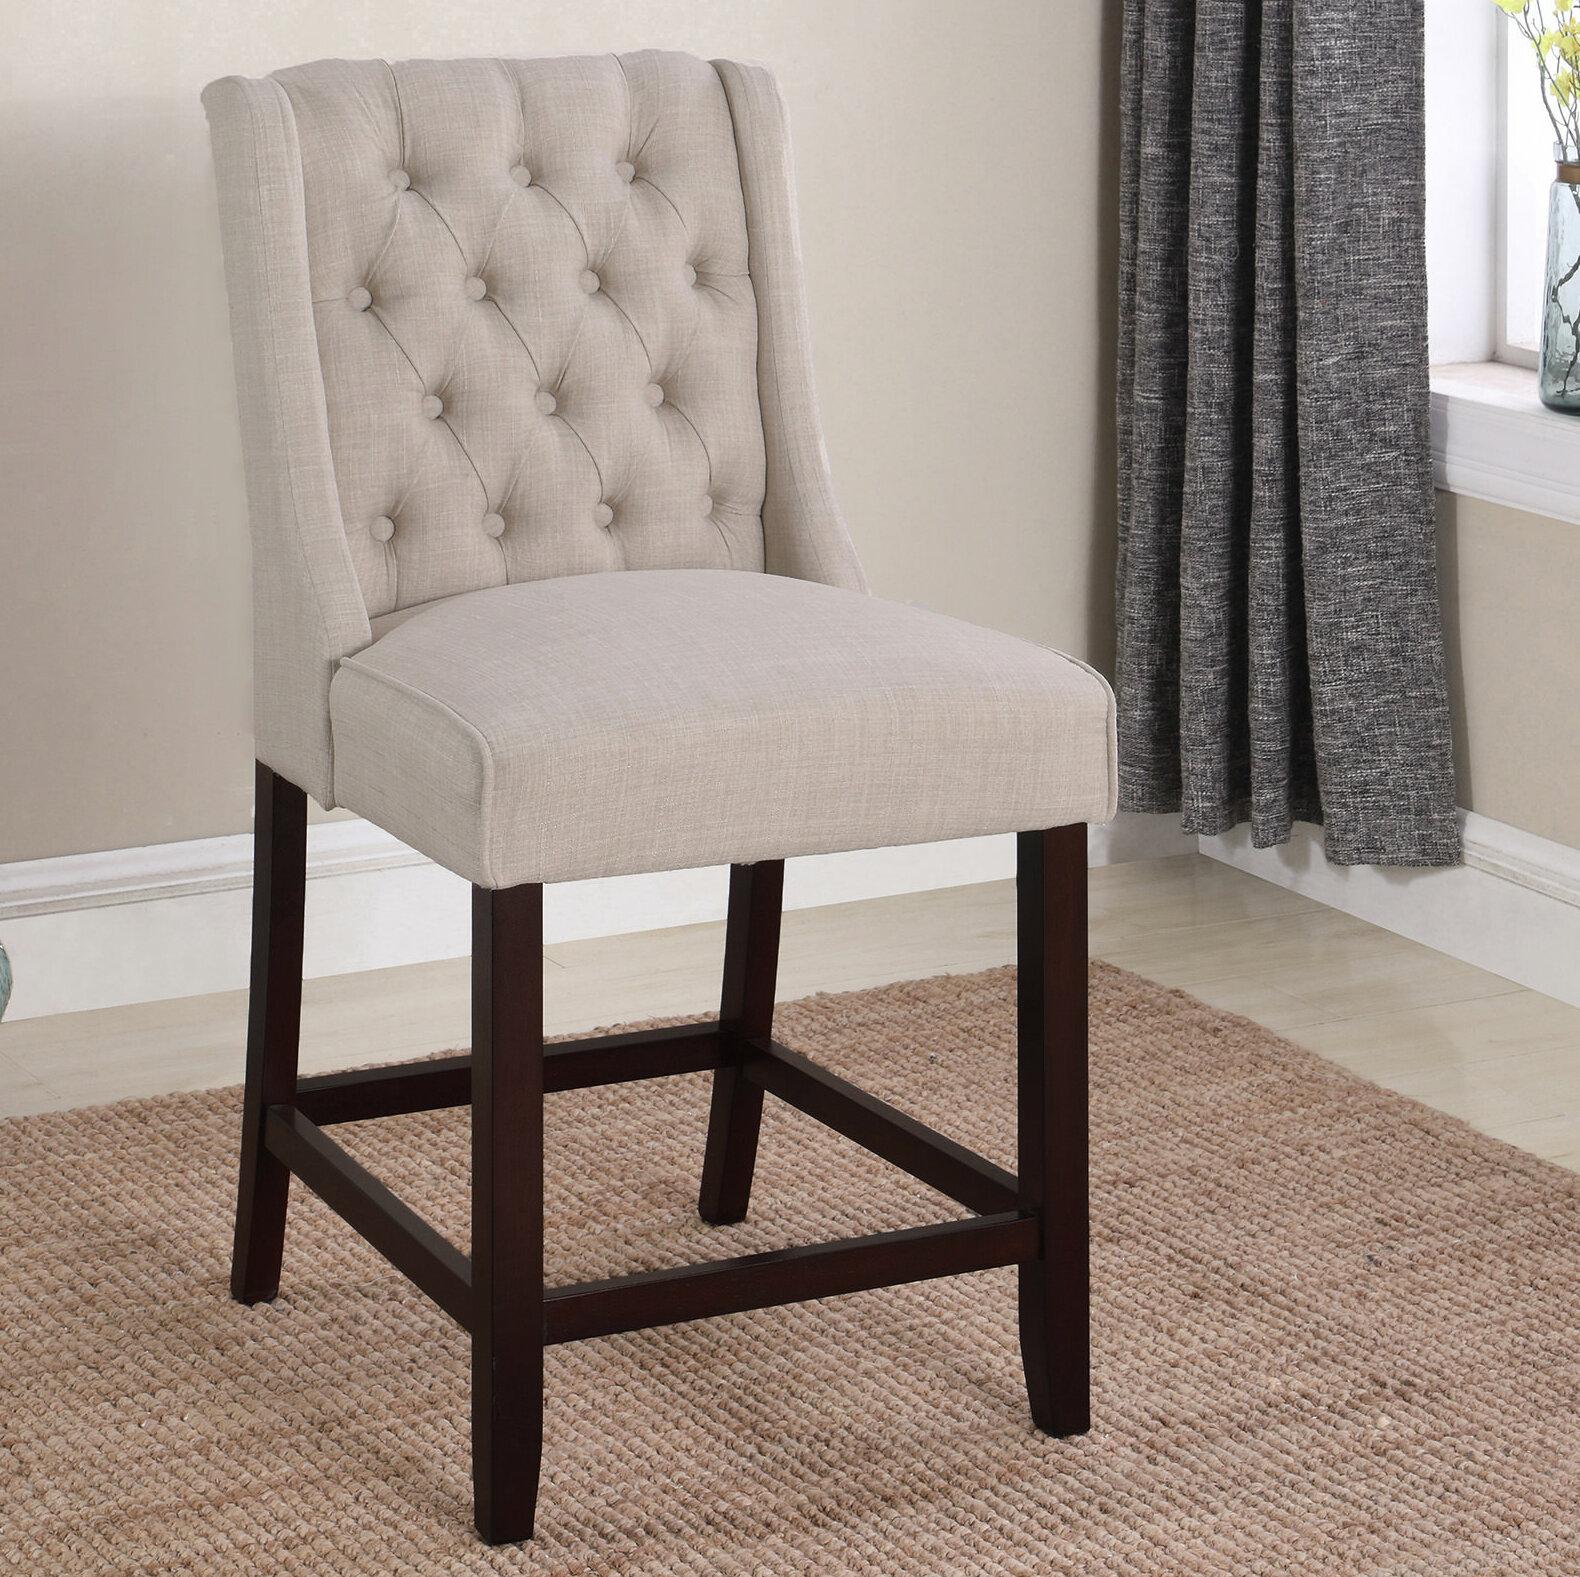 Cool Remy 25 Bar Stool Spiritservingveterans Wood Chair Design Ideas Spiritservingveteransorg